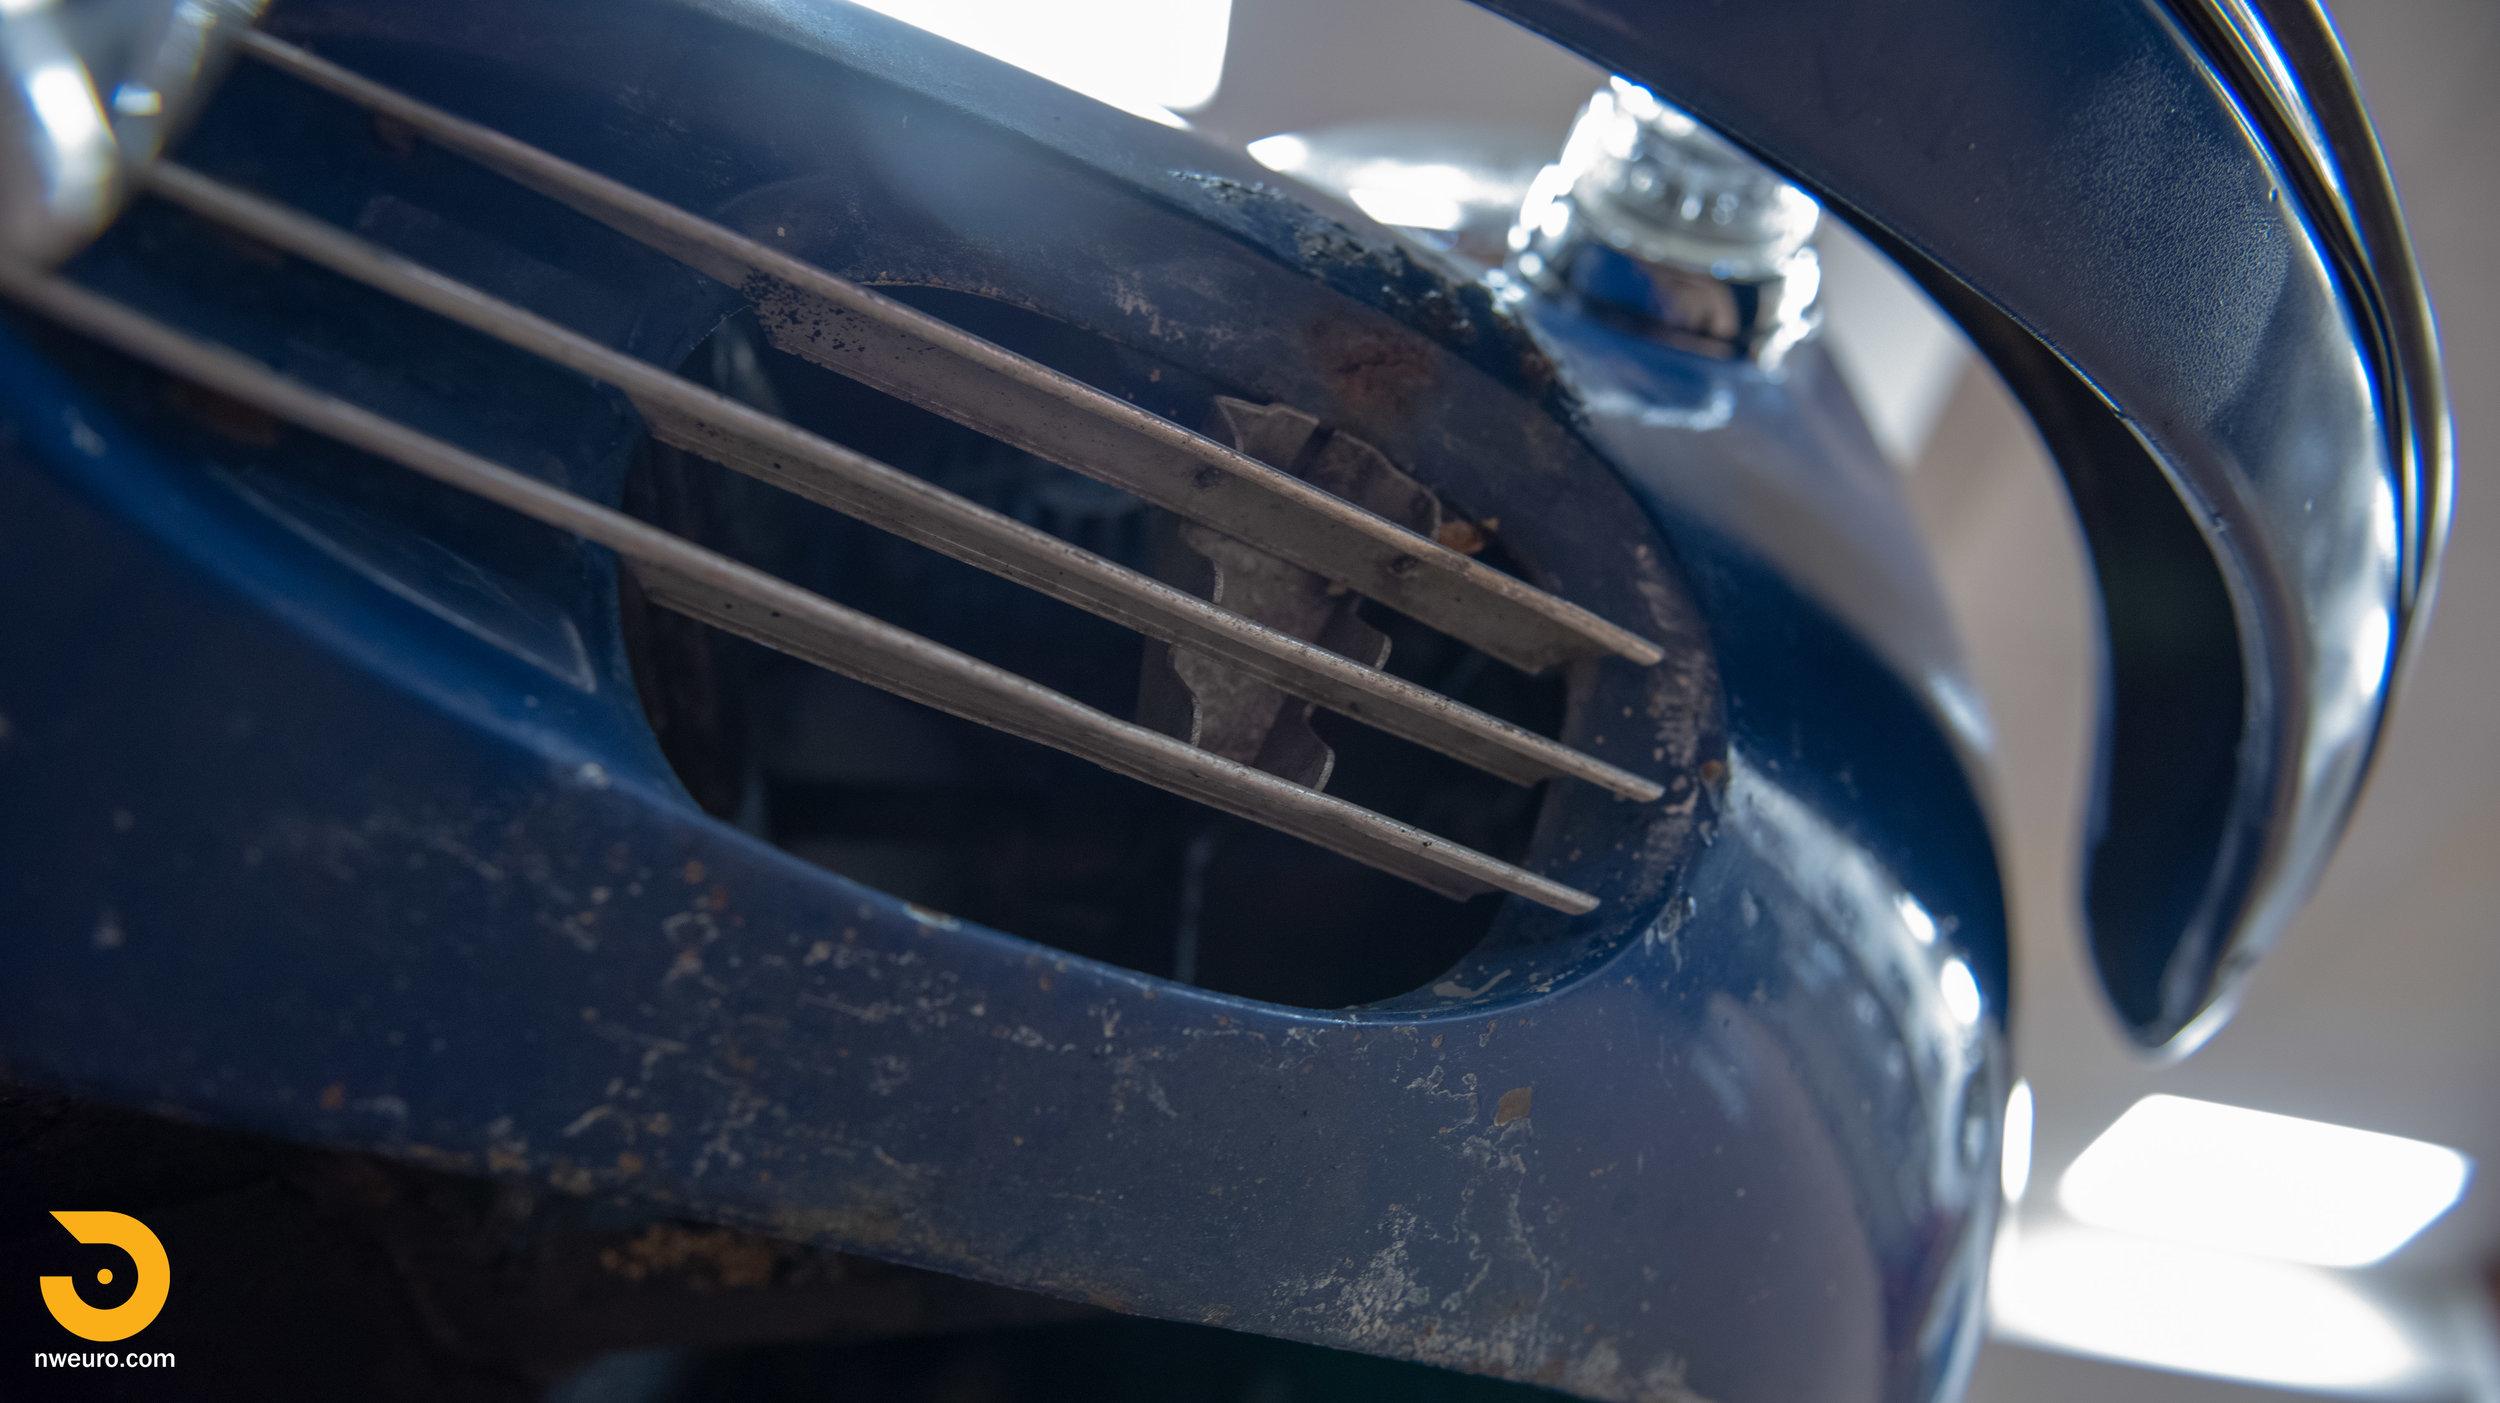 1960 Porsche 356 Hardtop Cab 1600 Super Chassis-6.jpg